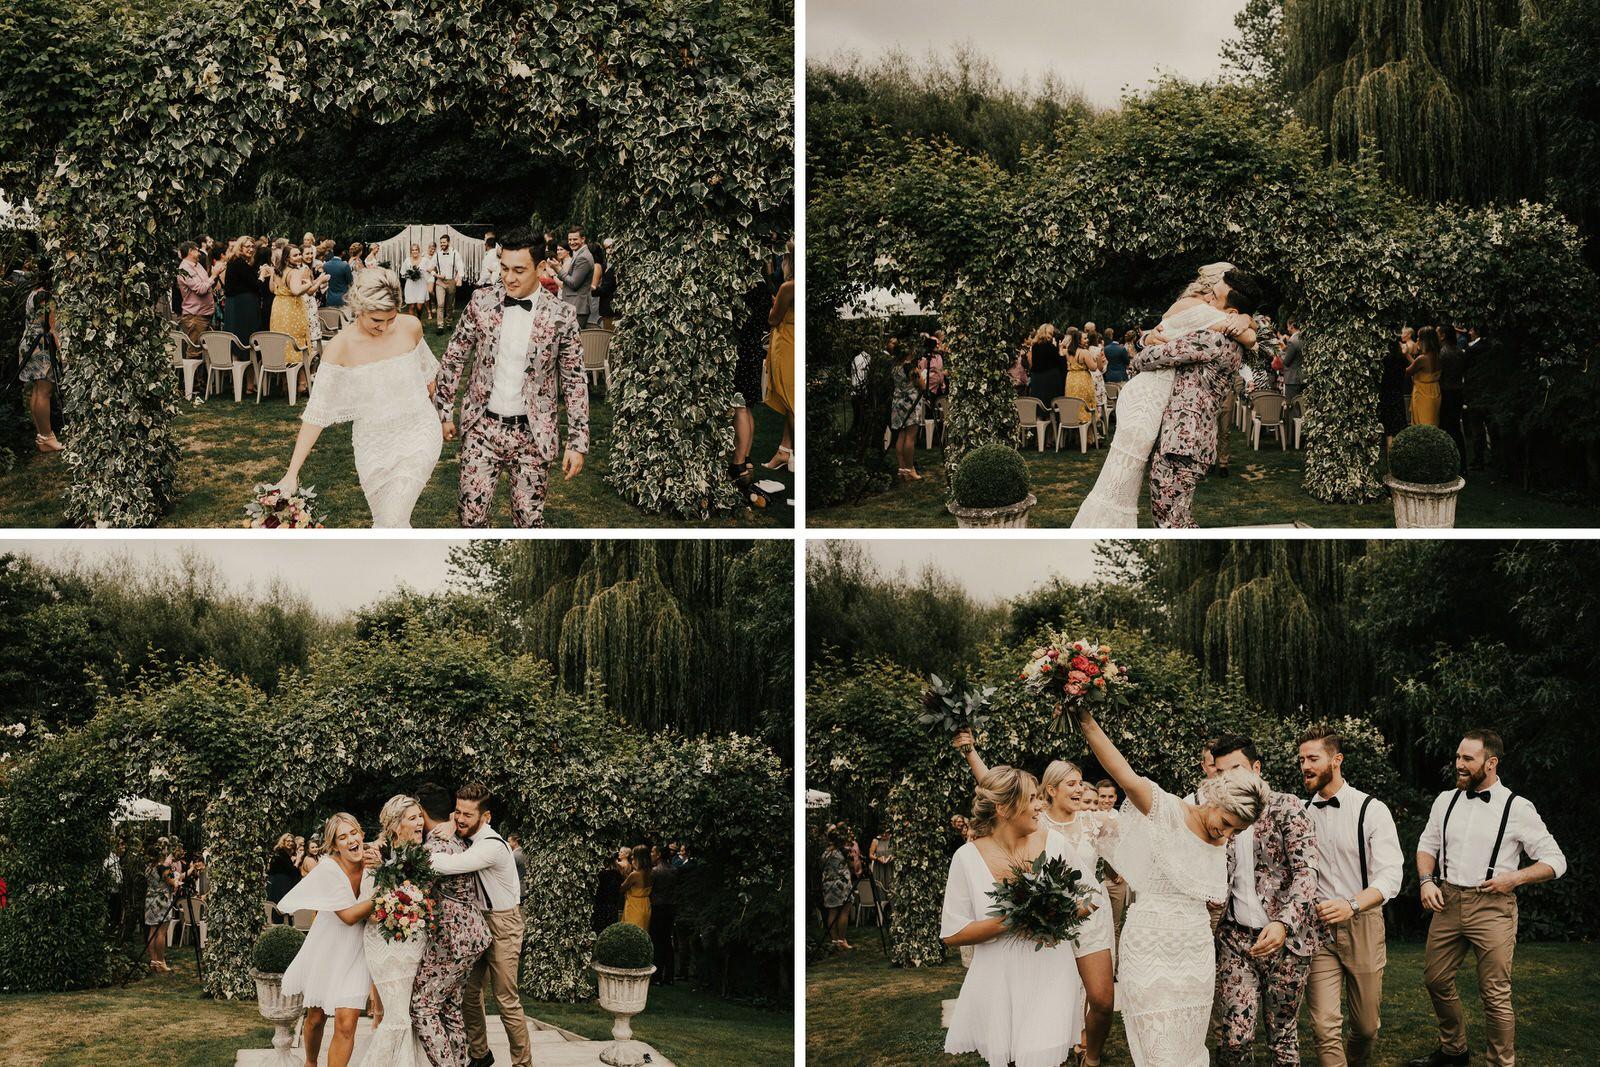 Wairarapa-Wedding_The-Landing_050.JPG